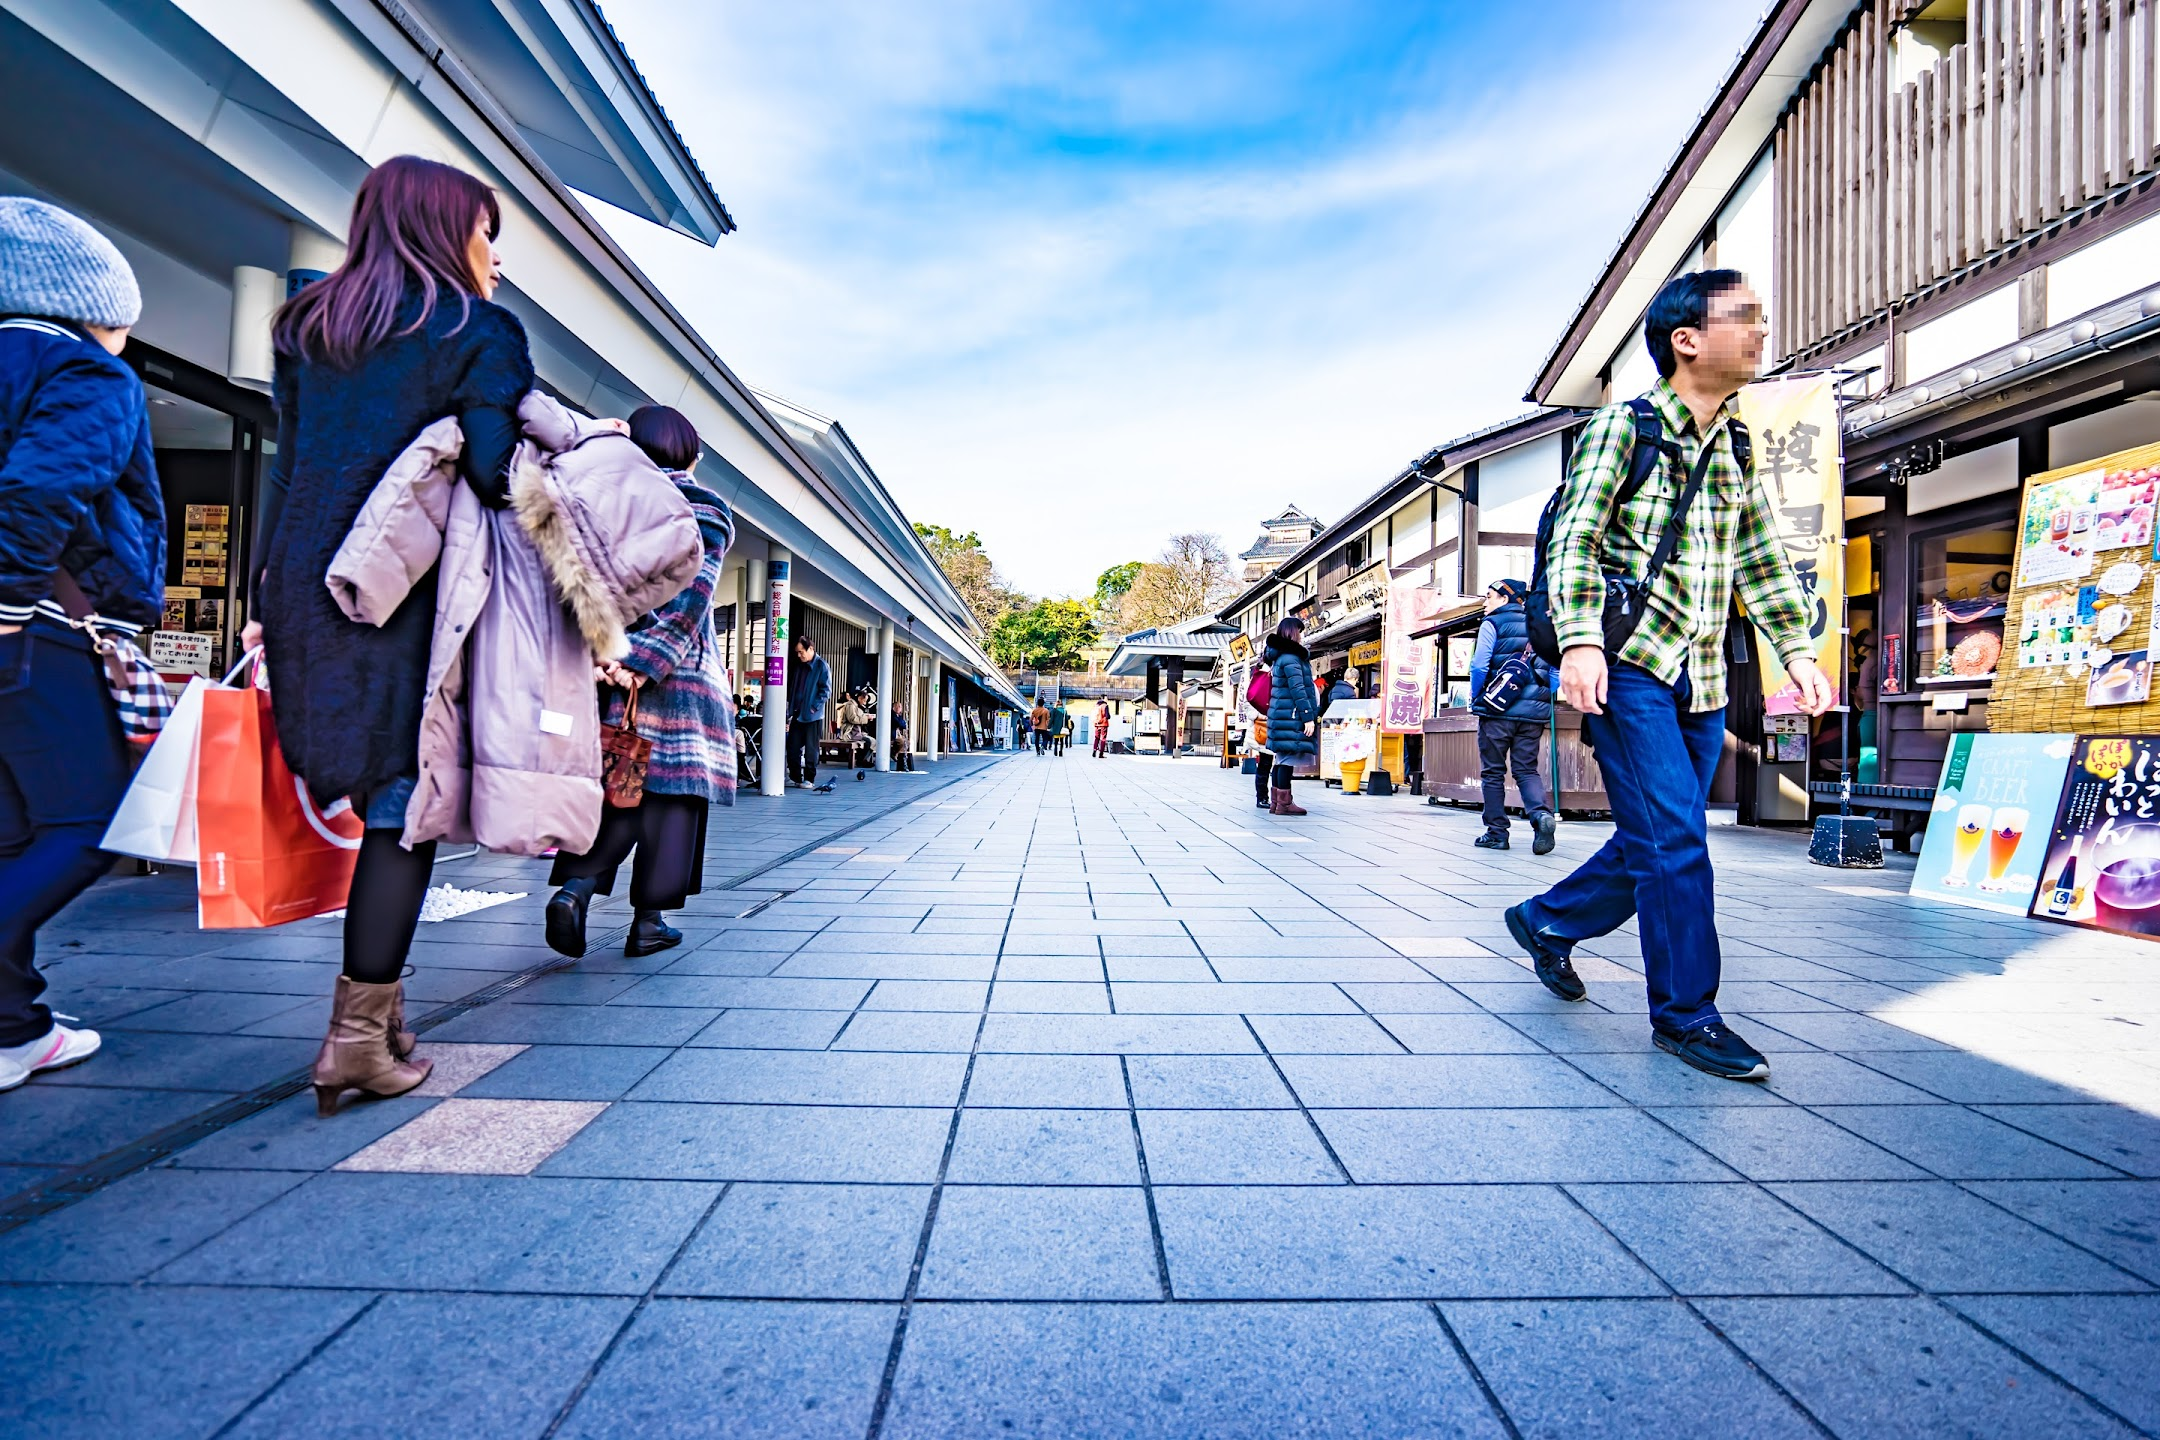 熊本城 城彩苑 桜の小路3